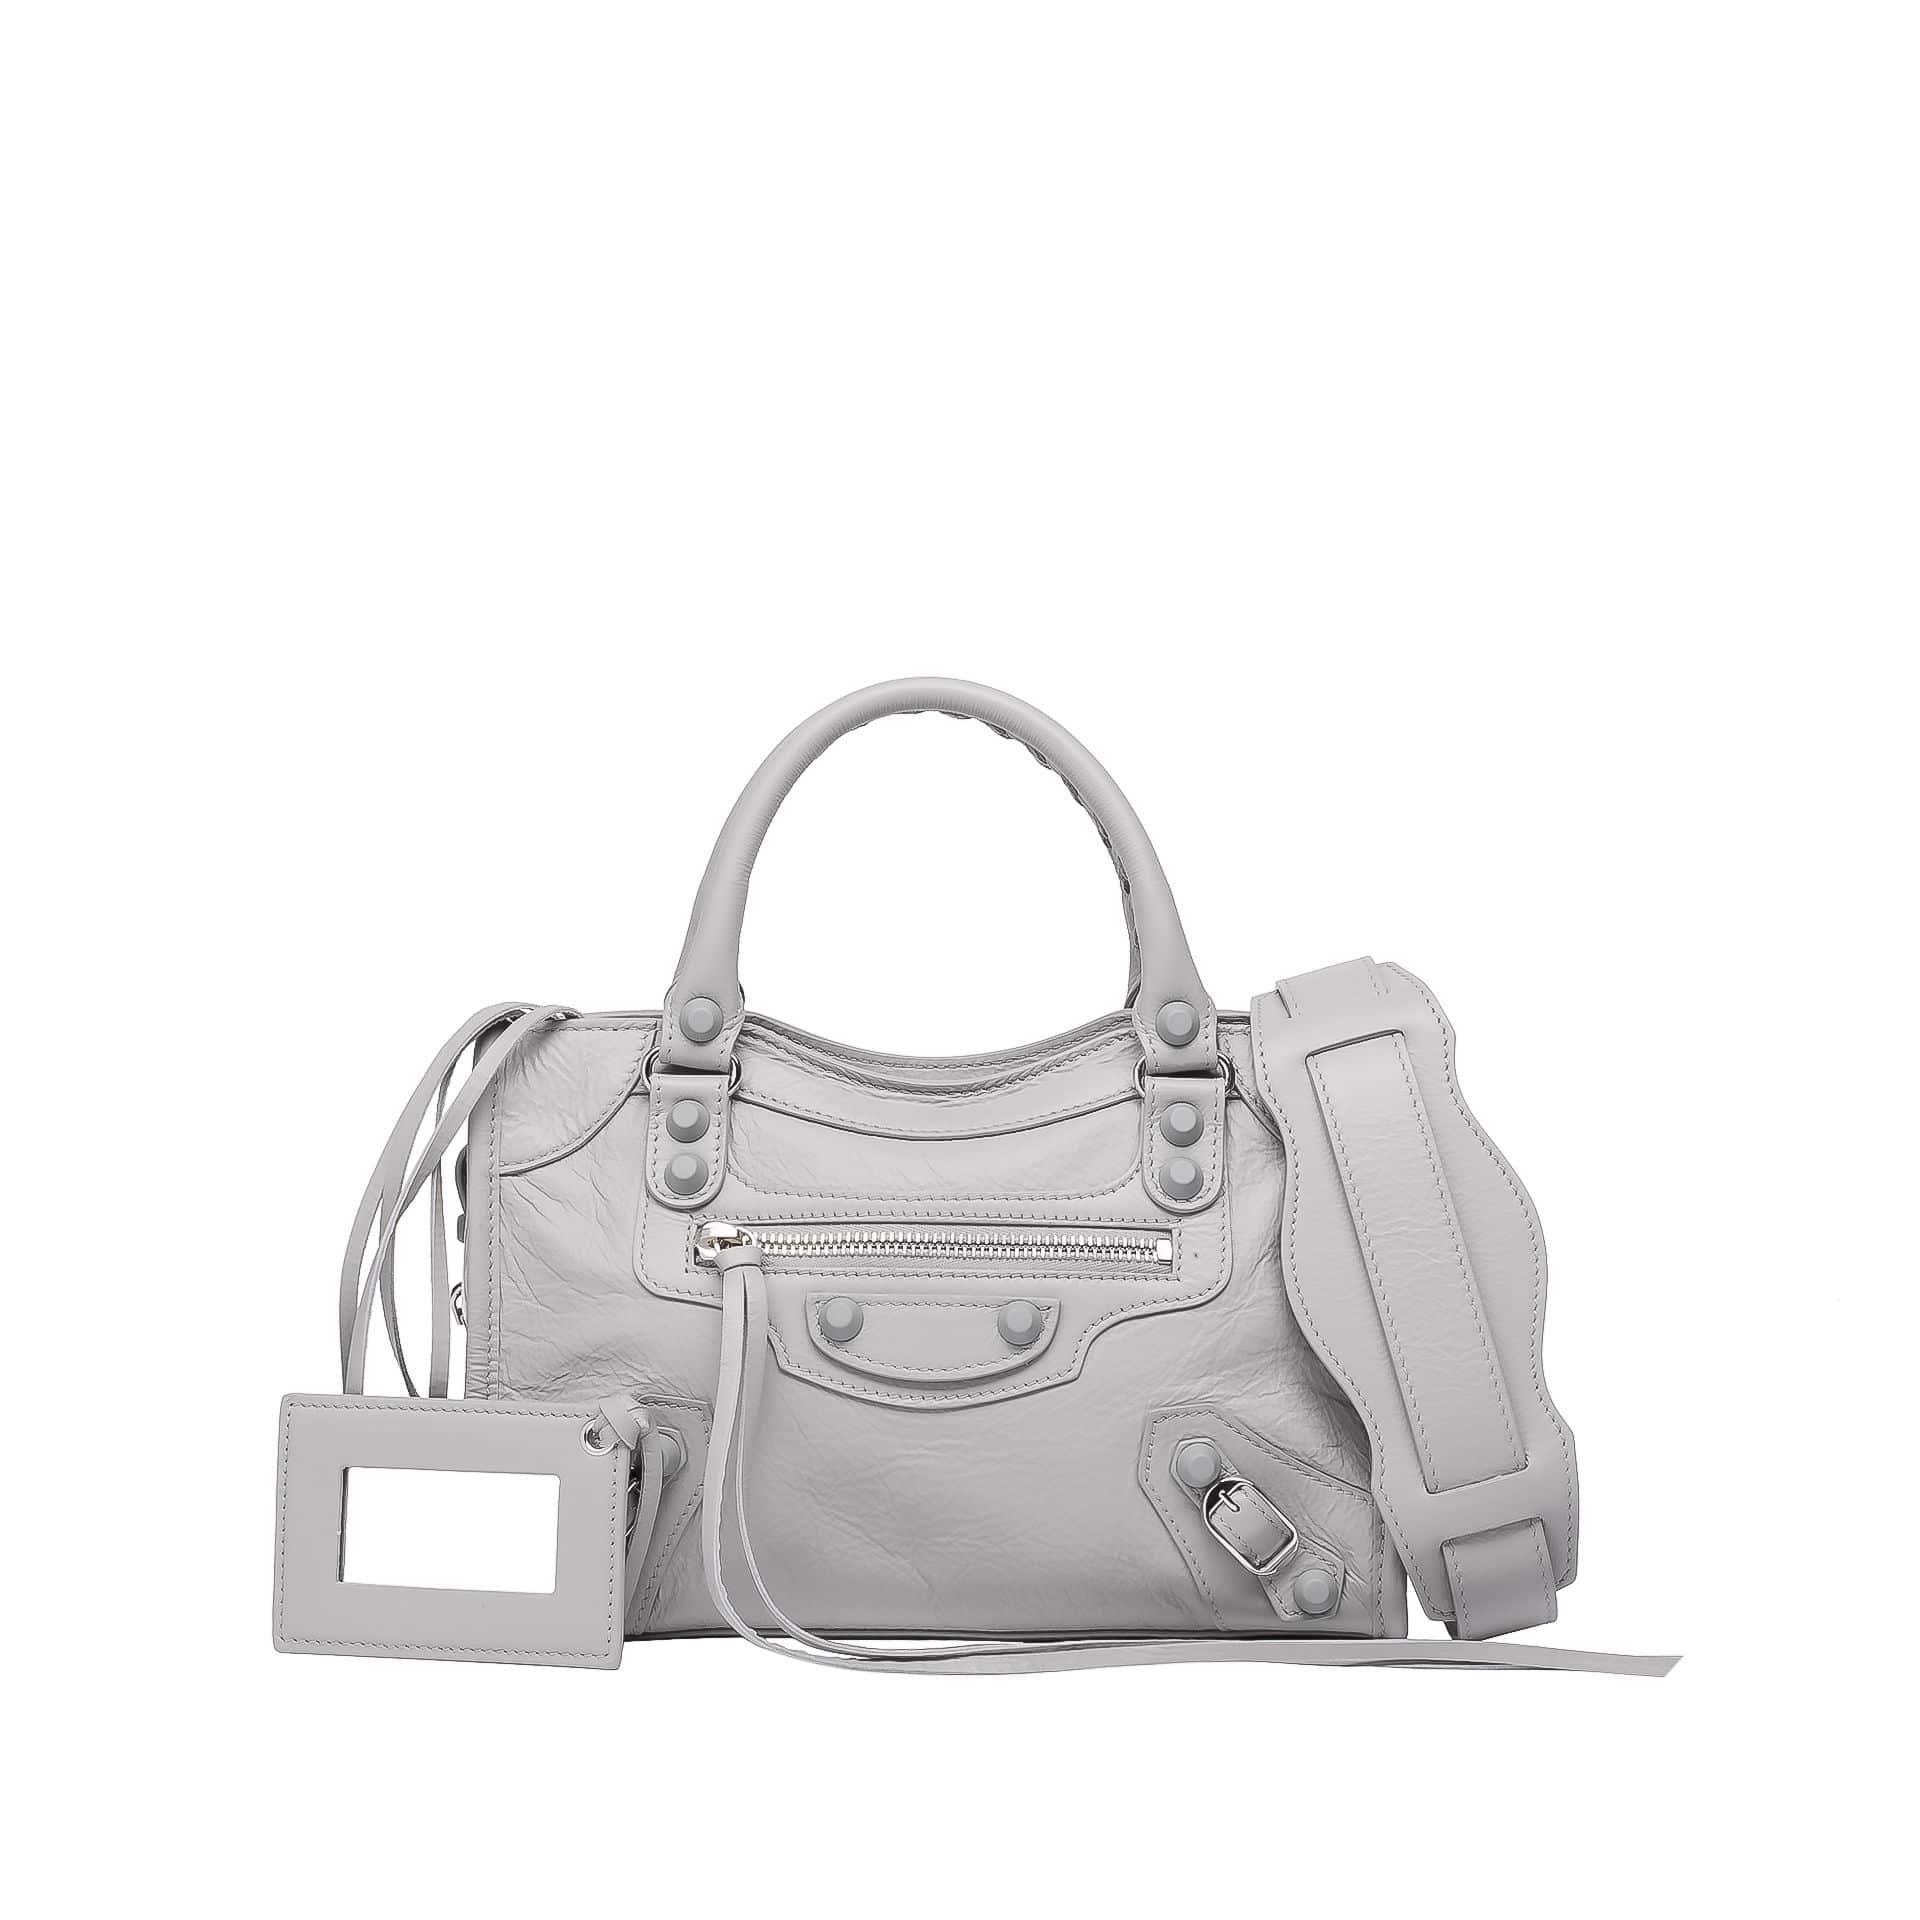 a0556ac1768e The Balenciaga Mini City Bag Colors and Styles for Spring   Summer ...